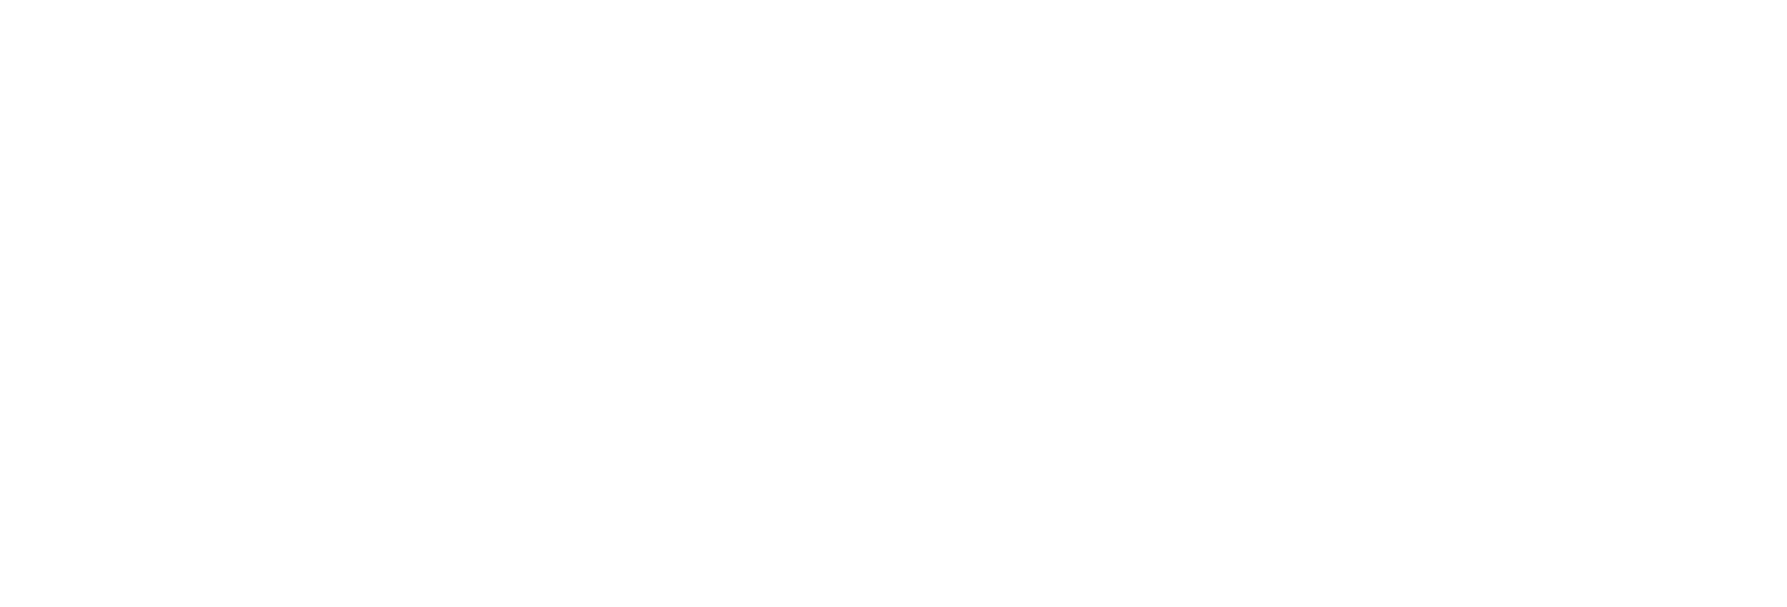 AJR-News.com ロゴ